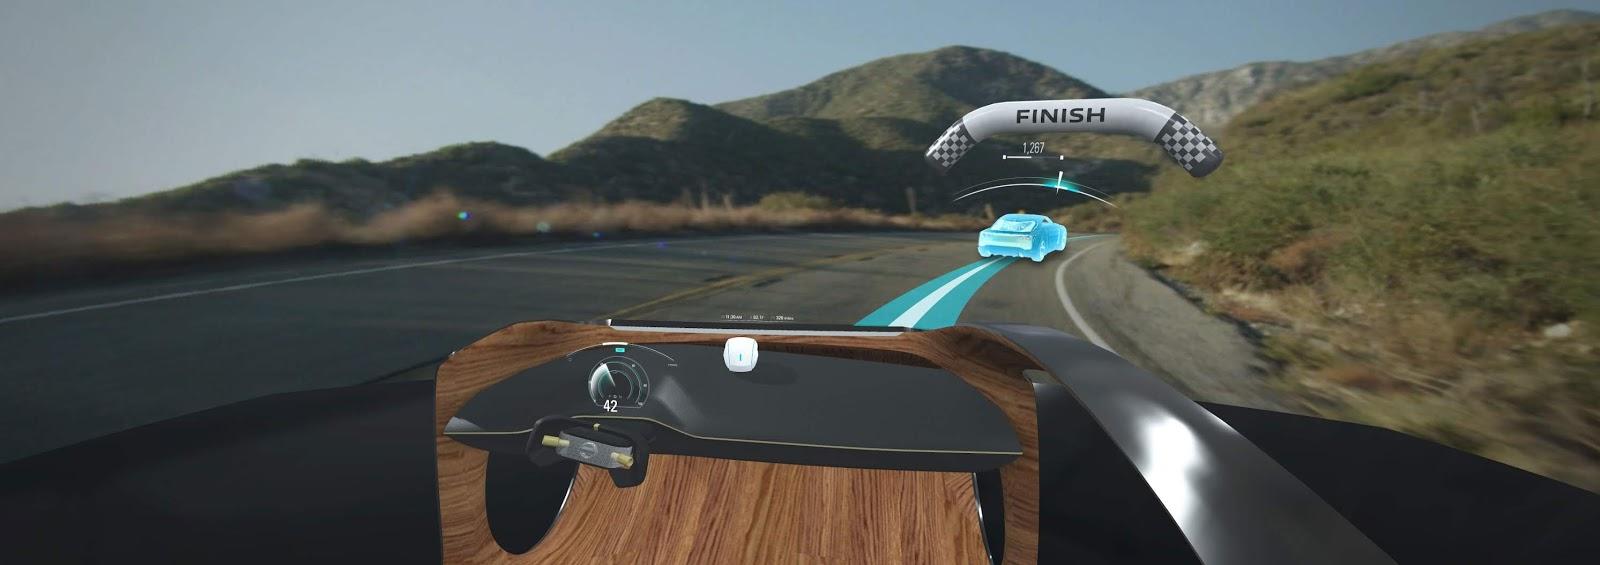 NISSAN I2V 4 Η Nissan σχεδιάζει augmented reality για τα μοντέλα της Nissan, zblog, τεχνικά, Τεχνολογία